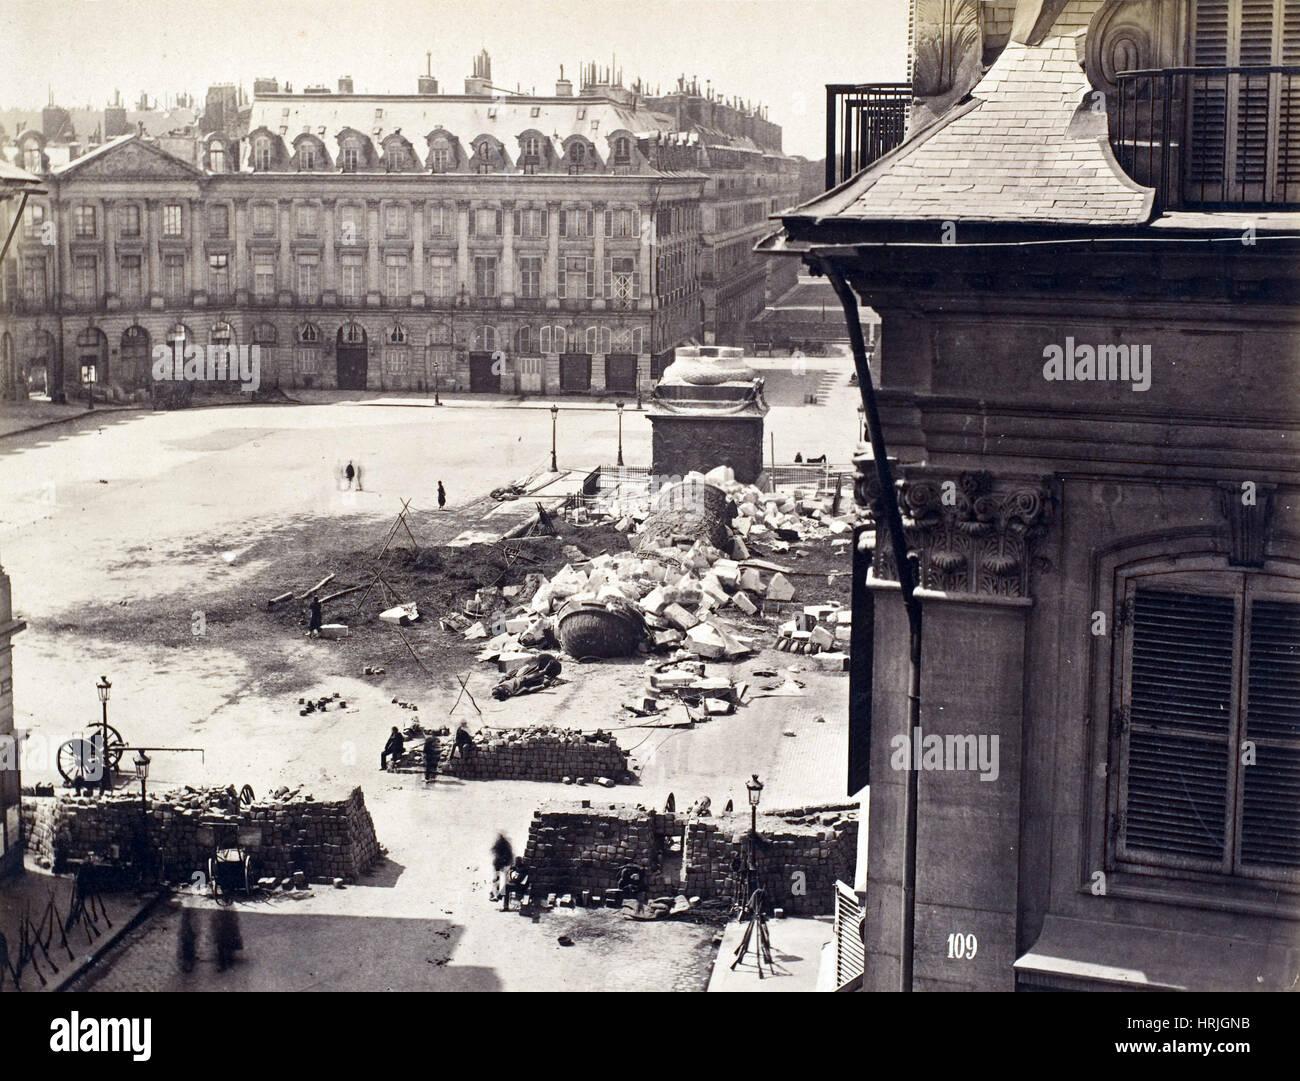 Paris Commune, Destroyed Vend̫me Column, 1871 - Stock Image